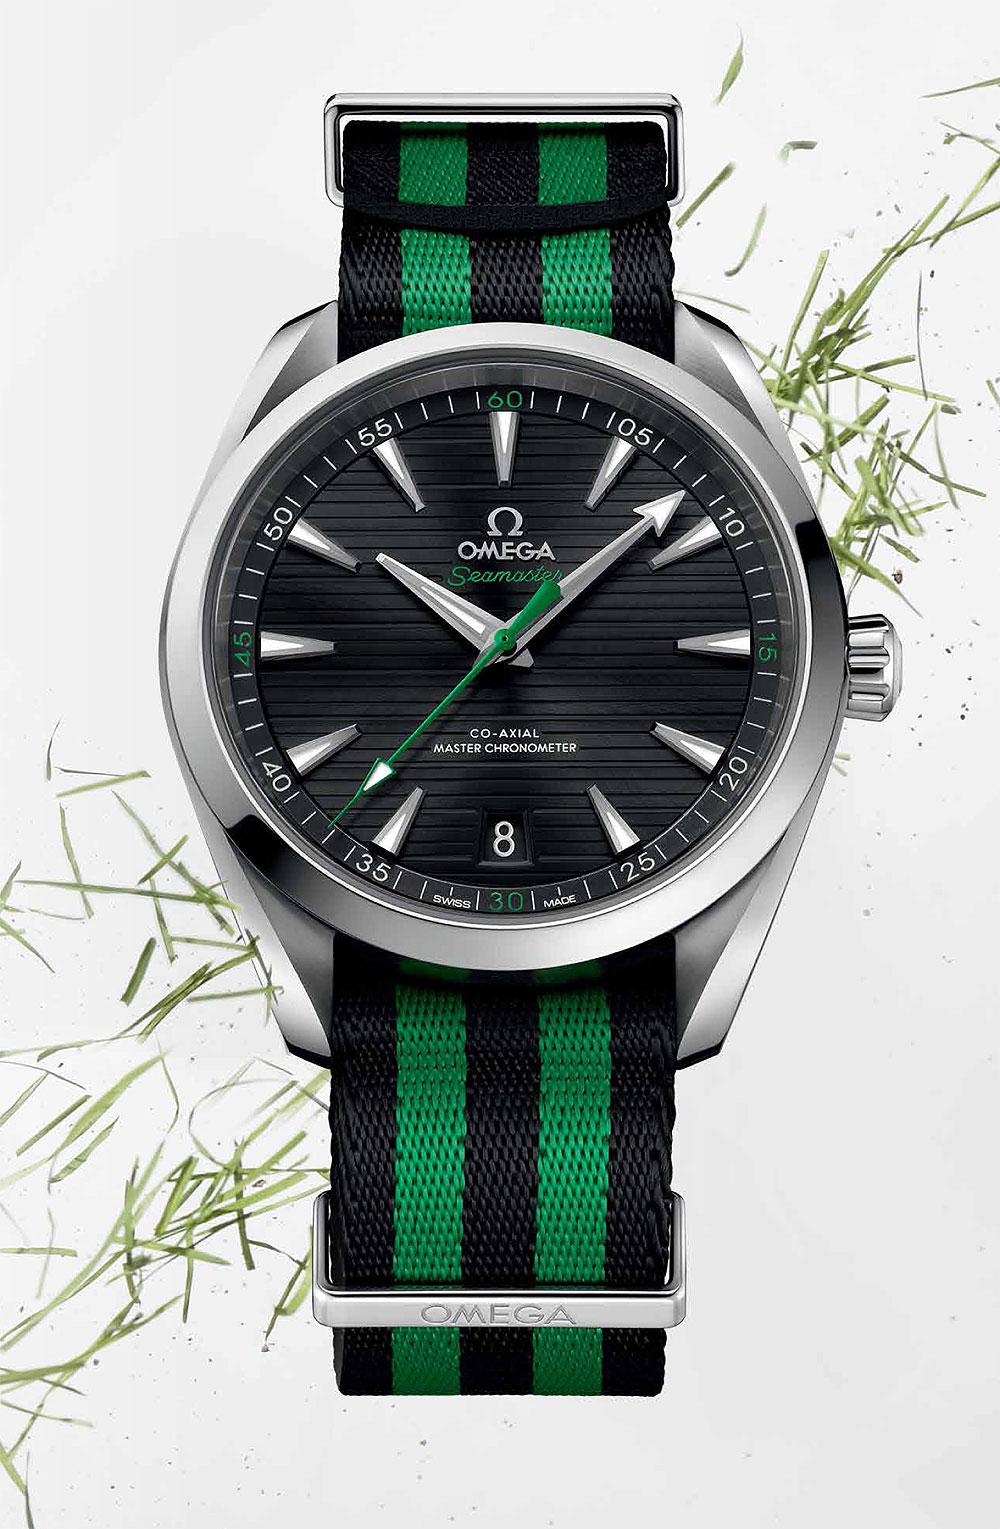 Replica watches high quality omega replica watches online part 5 for Omega replica watch